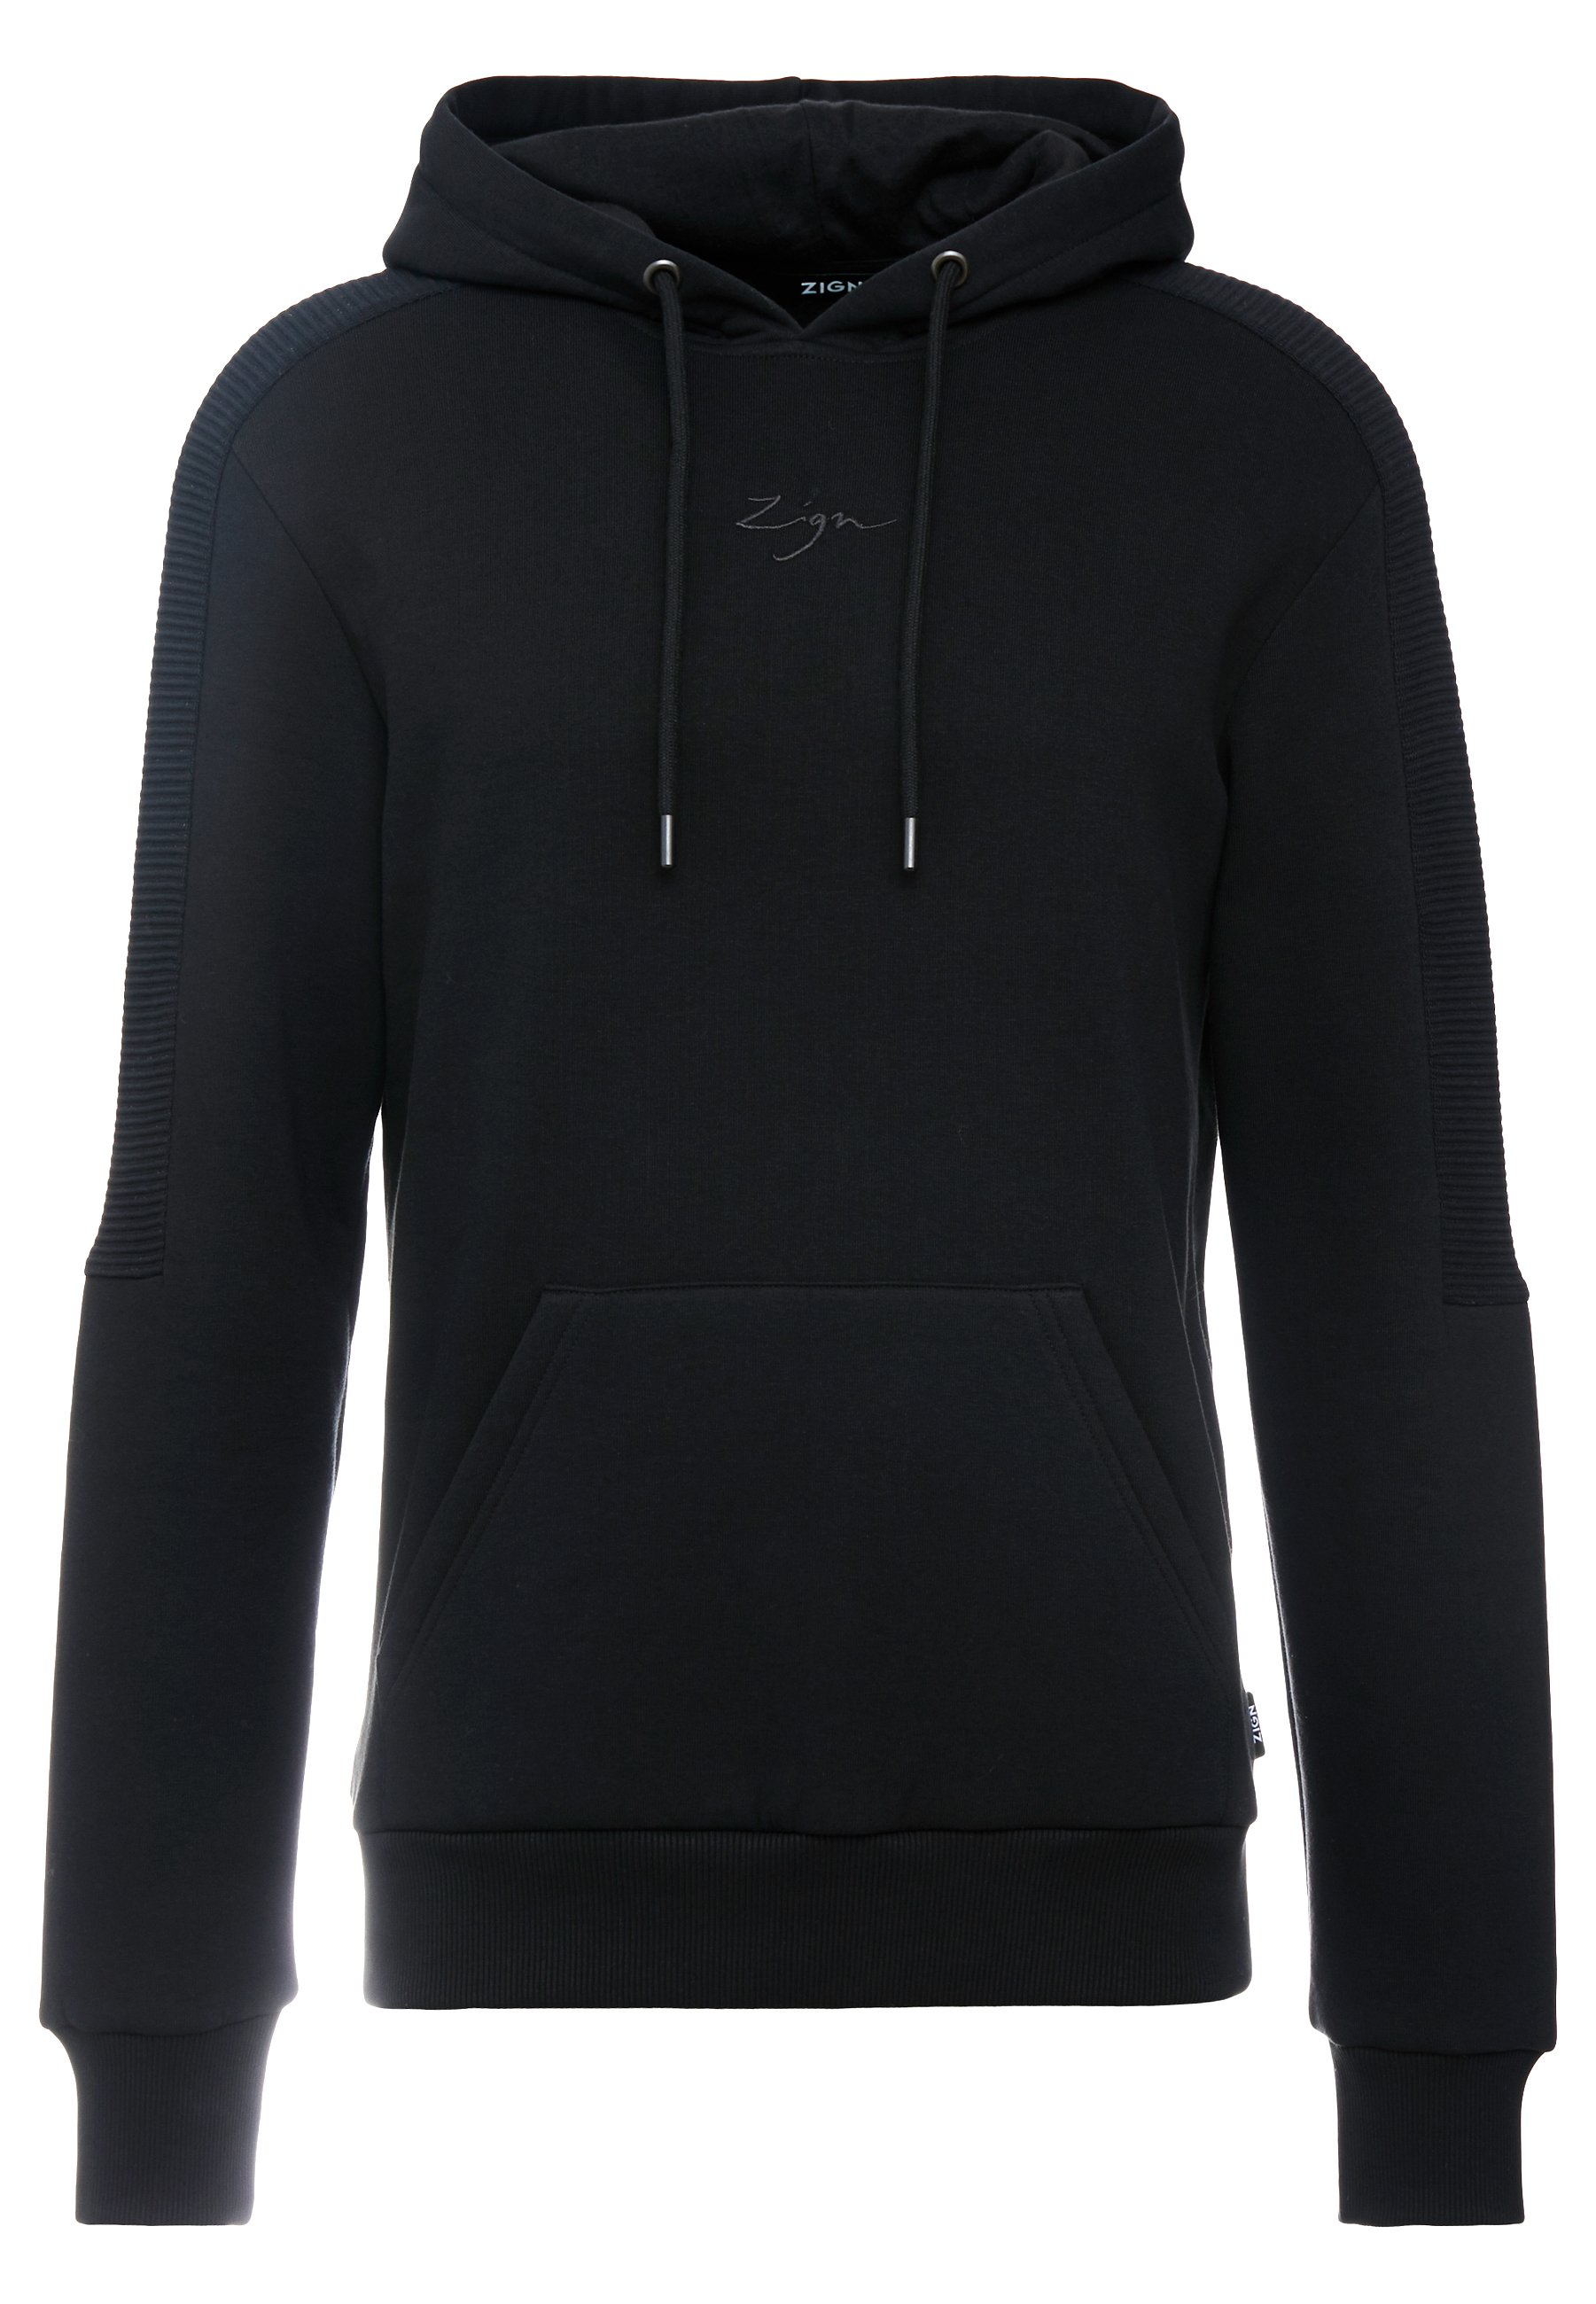 Zign Bluza z kapturem - black